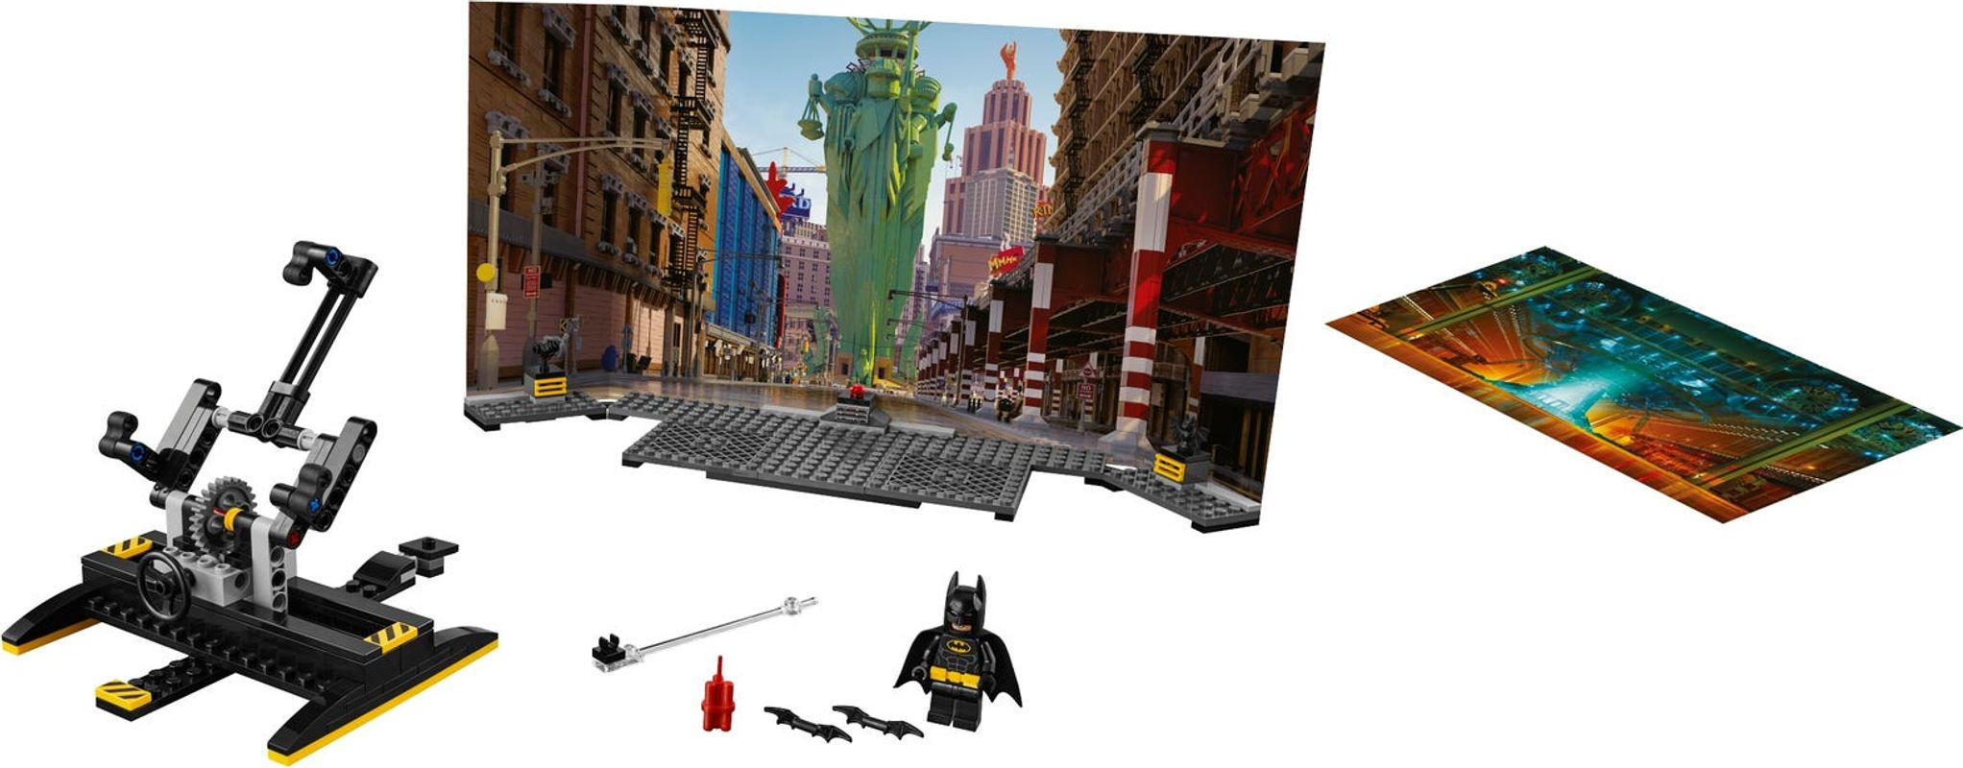 Batman™ Movie Maker Set components